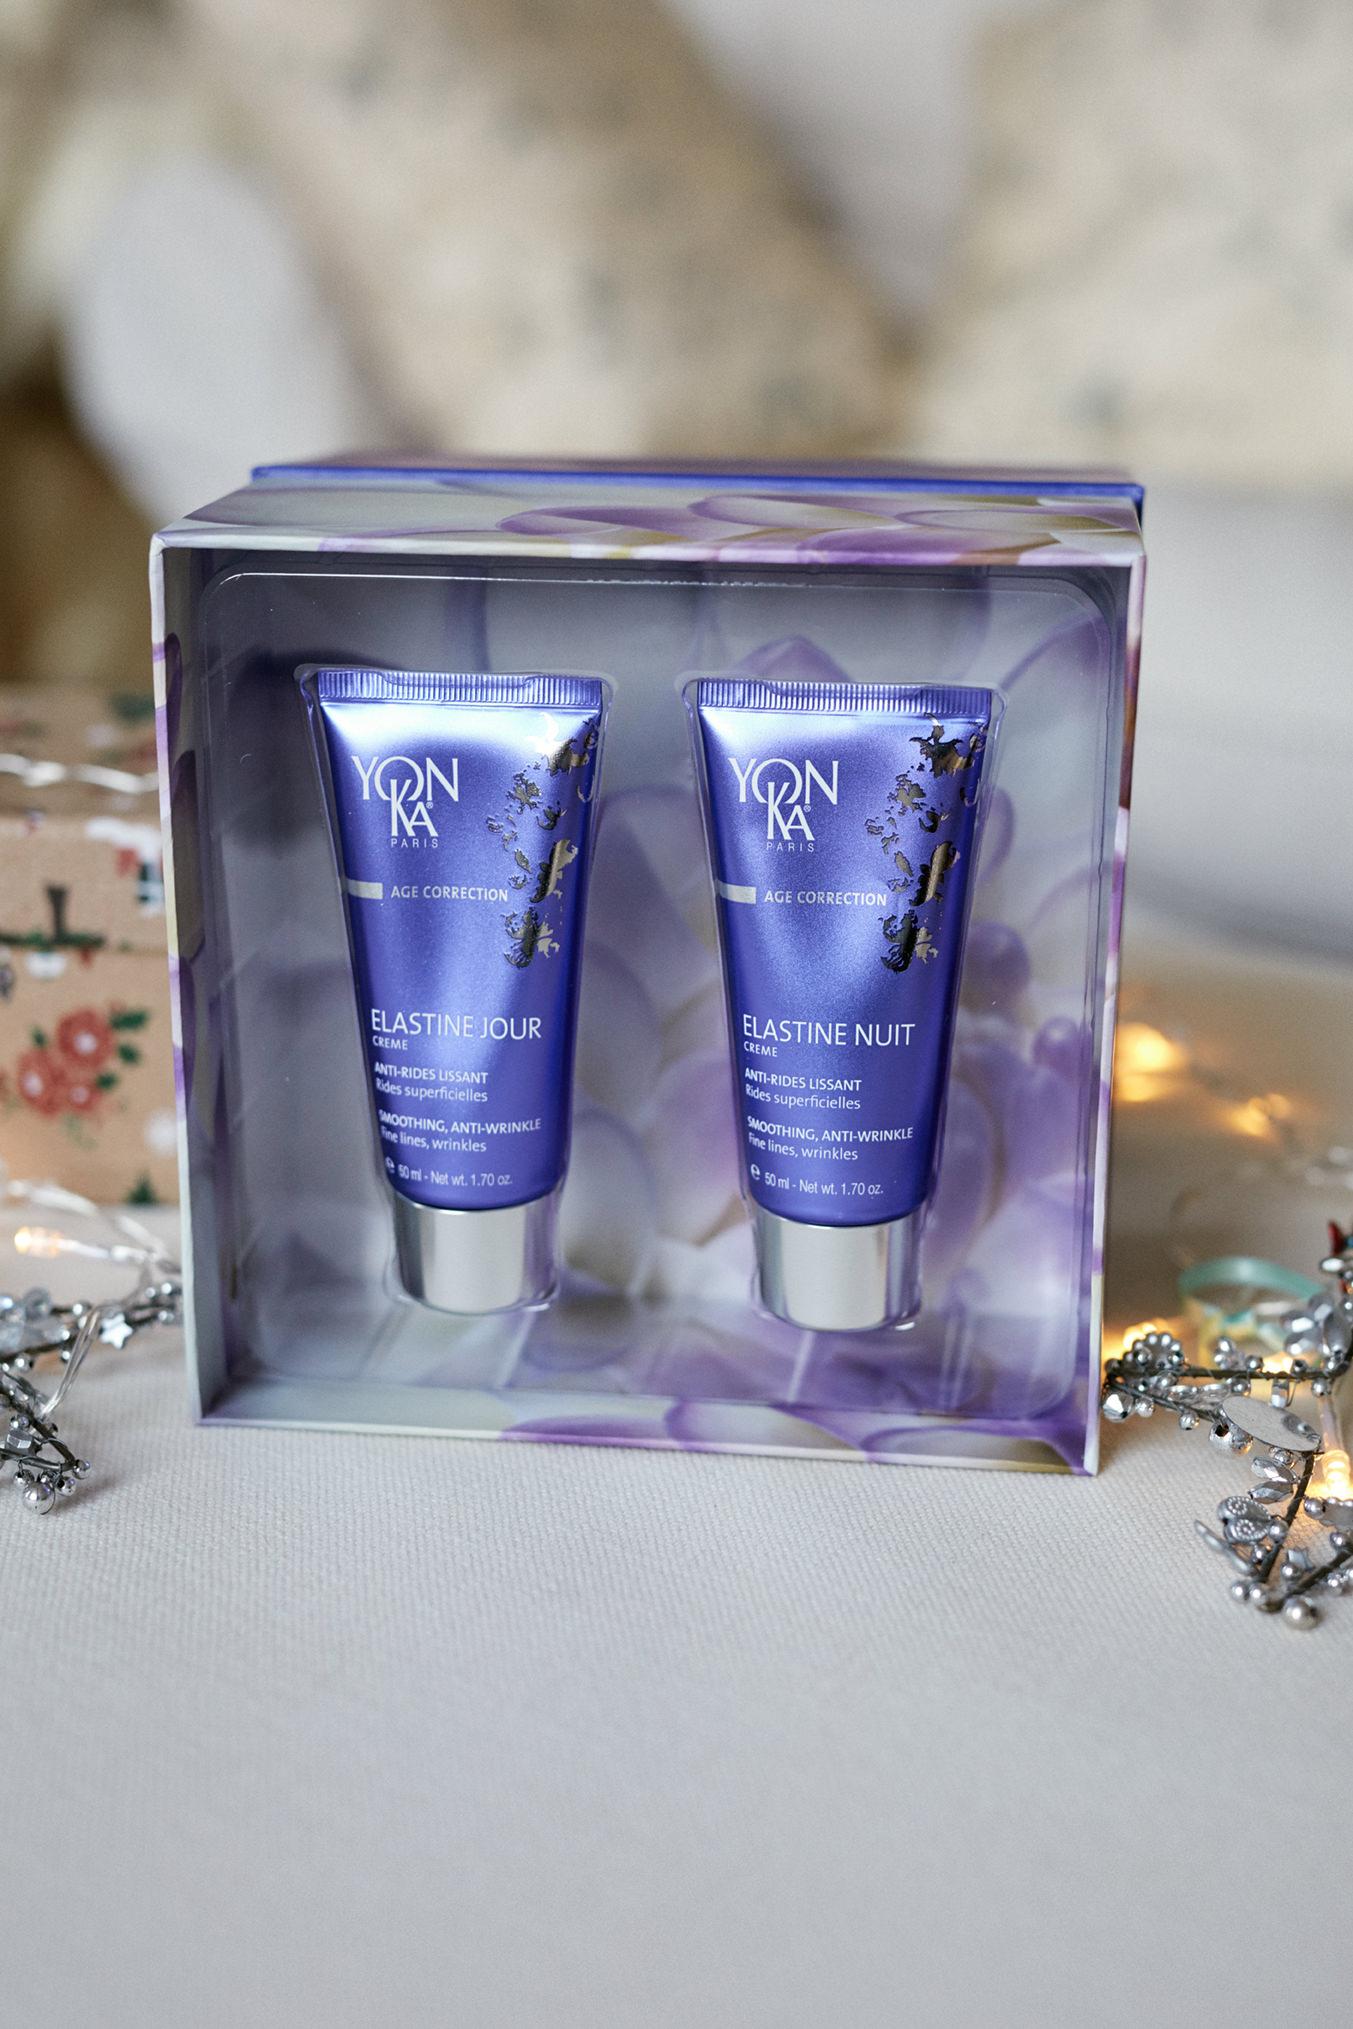 Yonka Christmas Gift Holly White Elastaine Jour